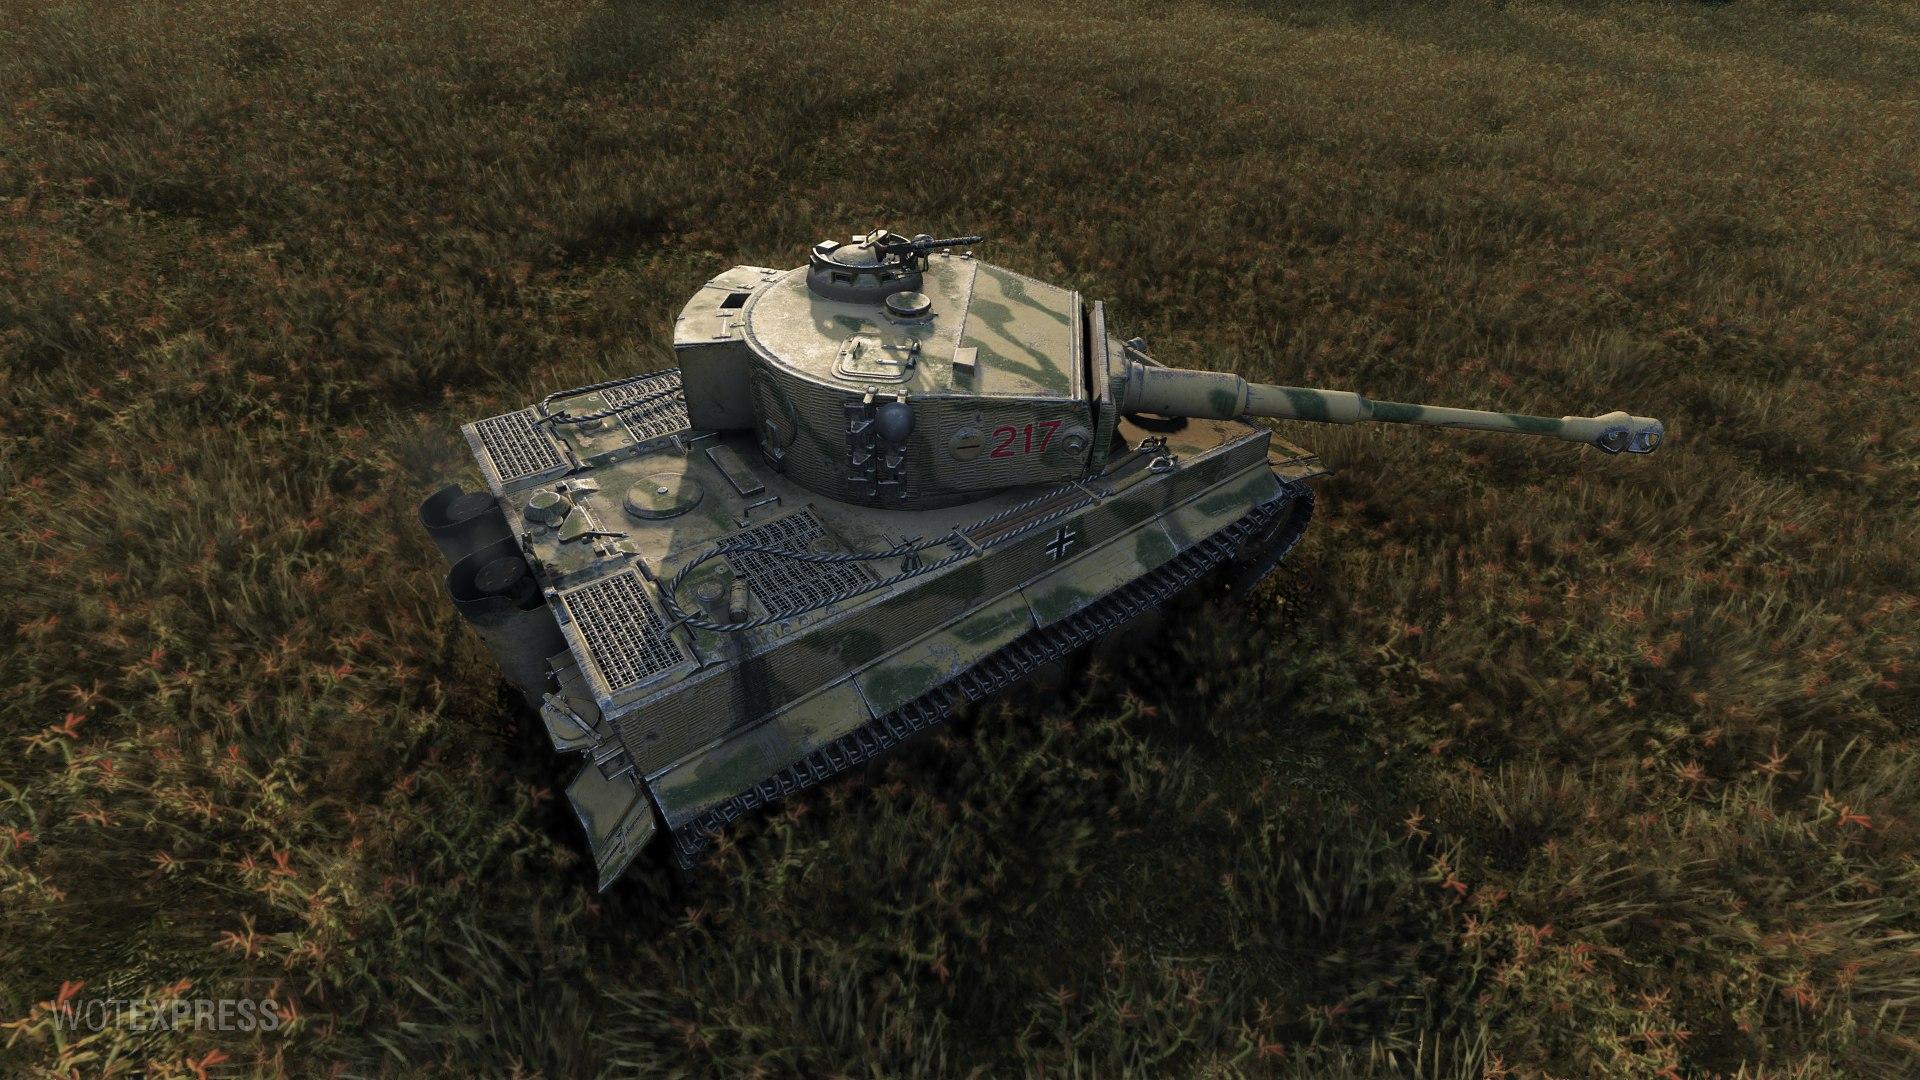 Tiger 217 Обзор еще одного Тигра.